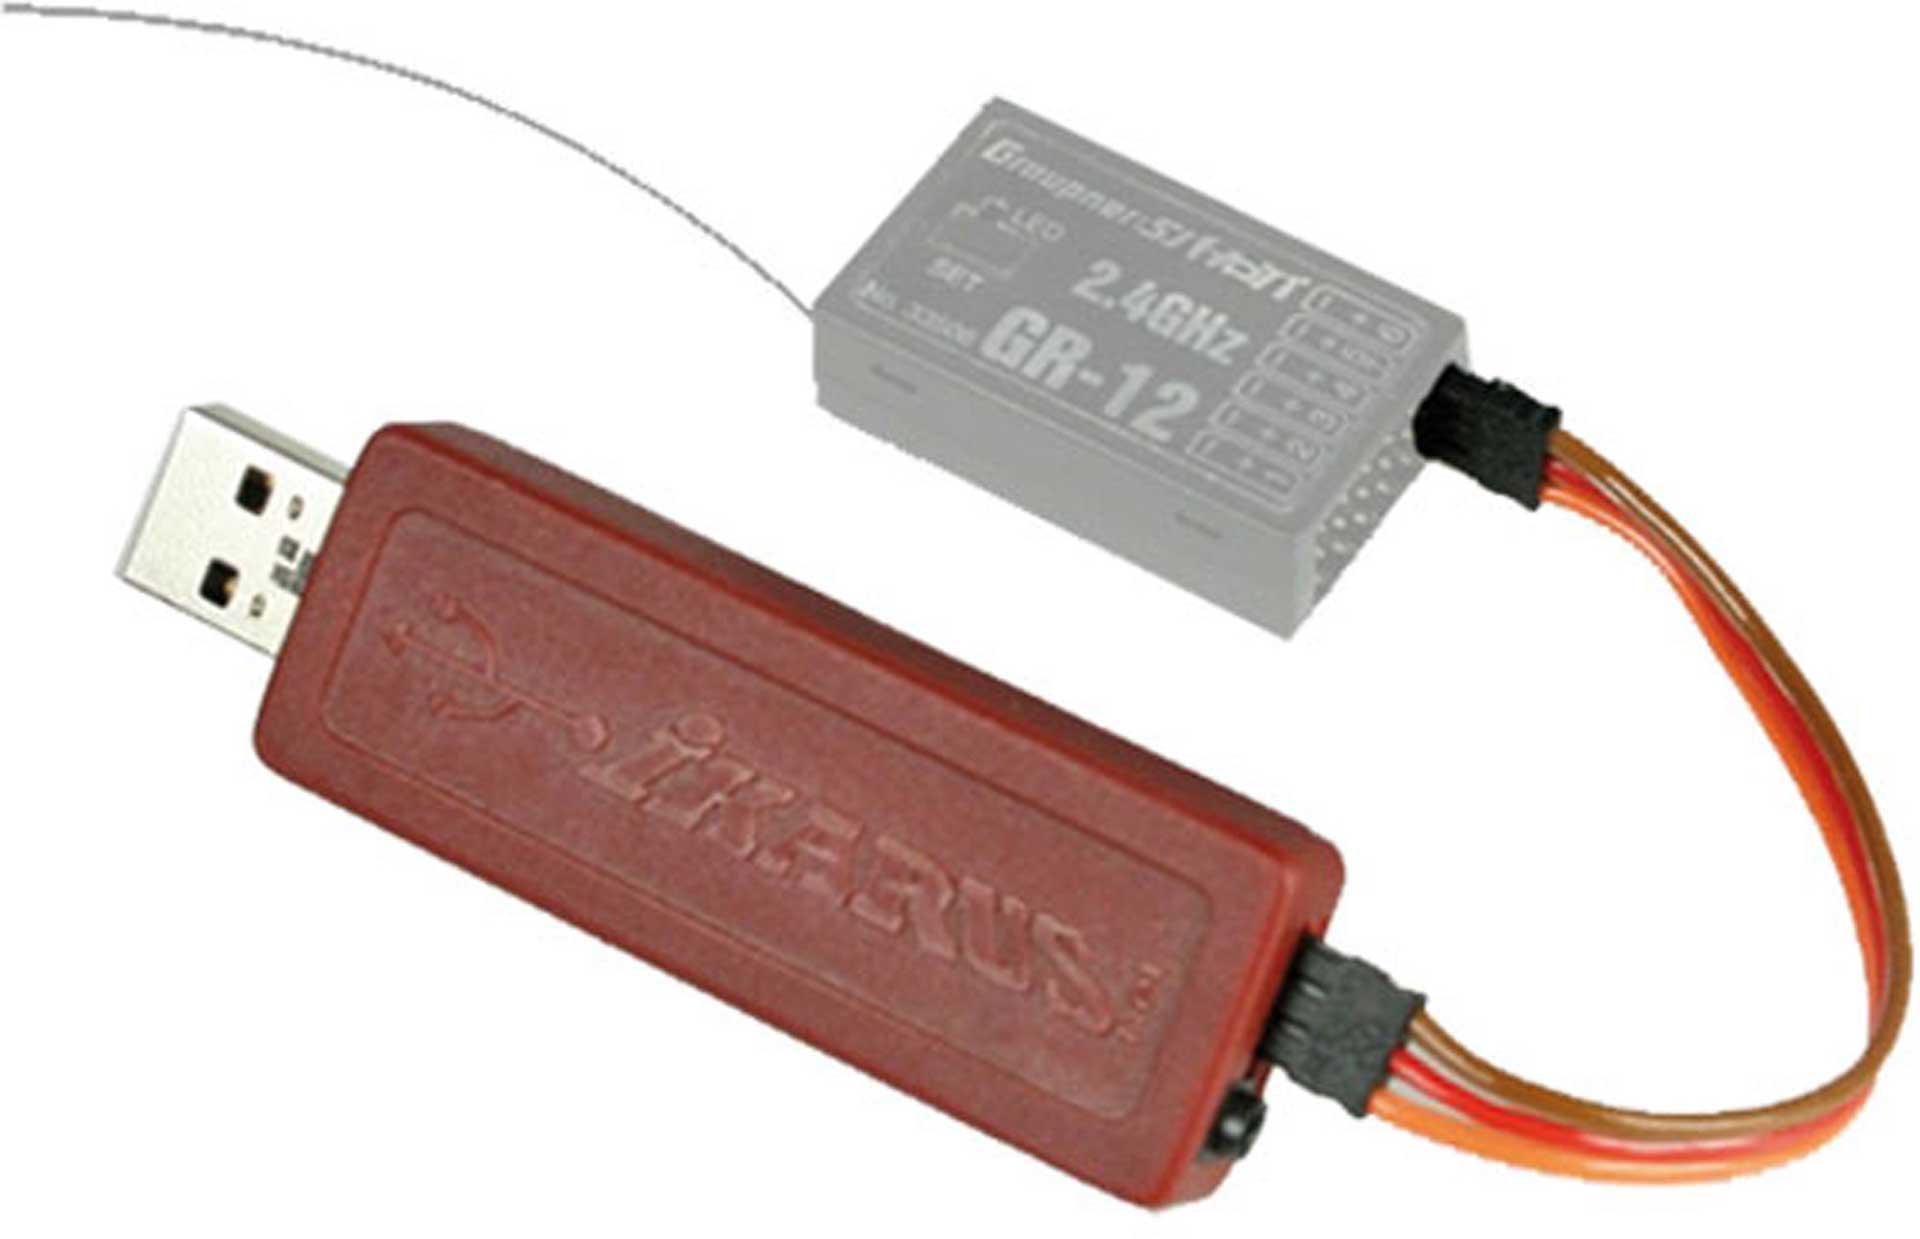 IKARUS USB-INTERFACE FOR GRAUPNER HOTT